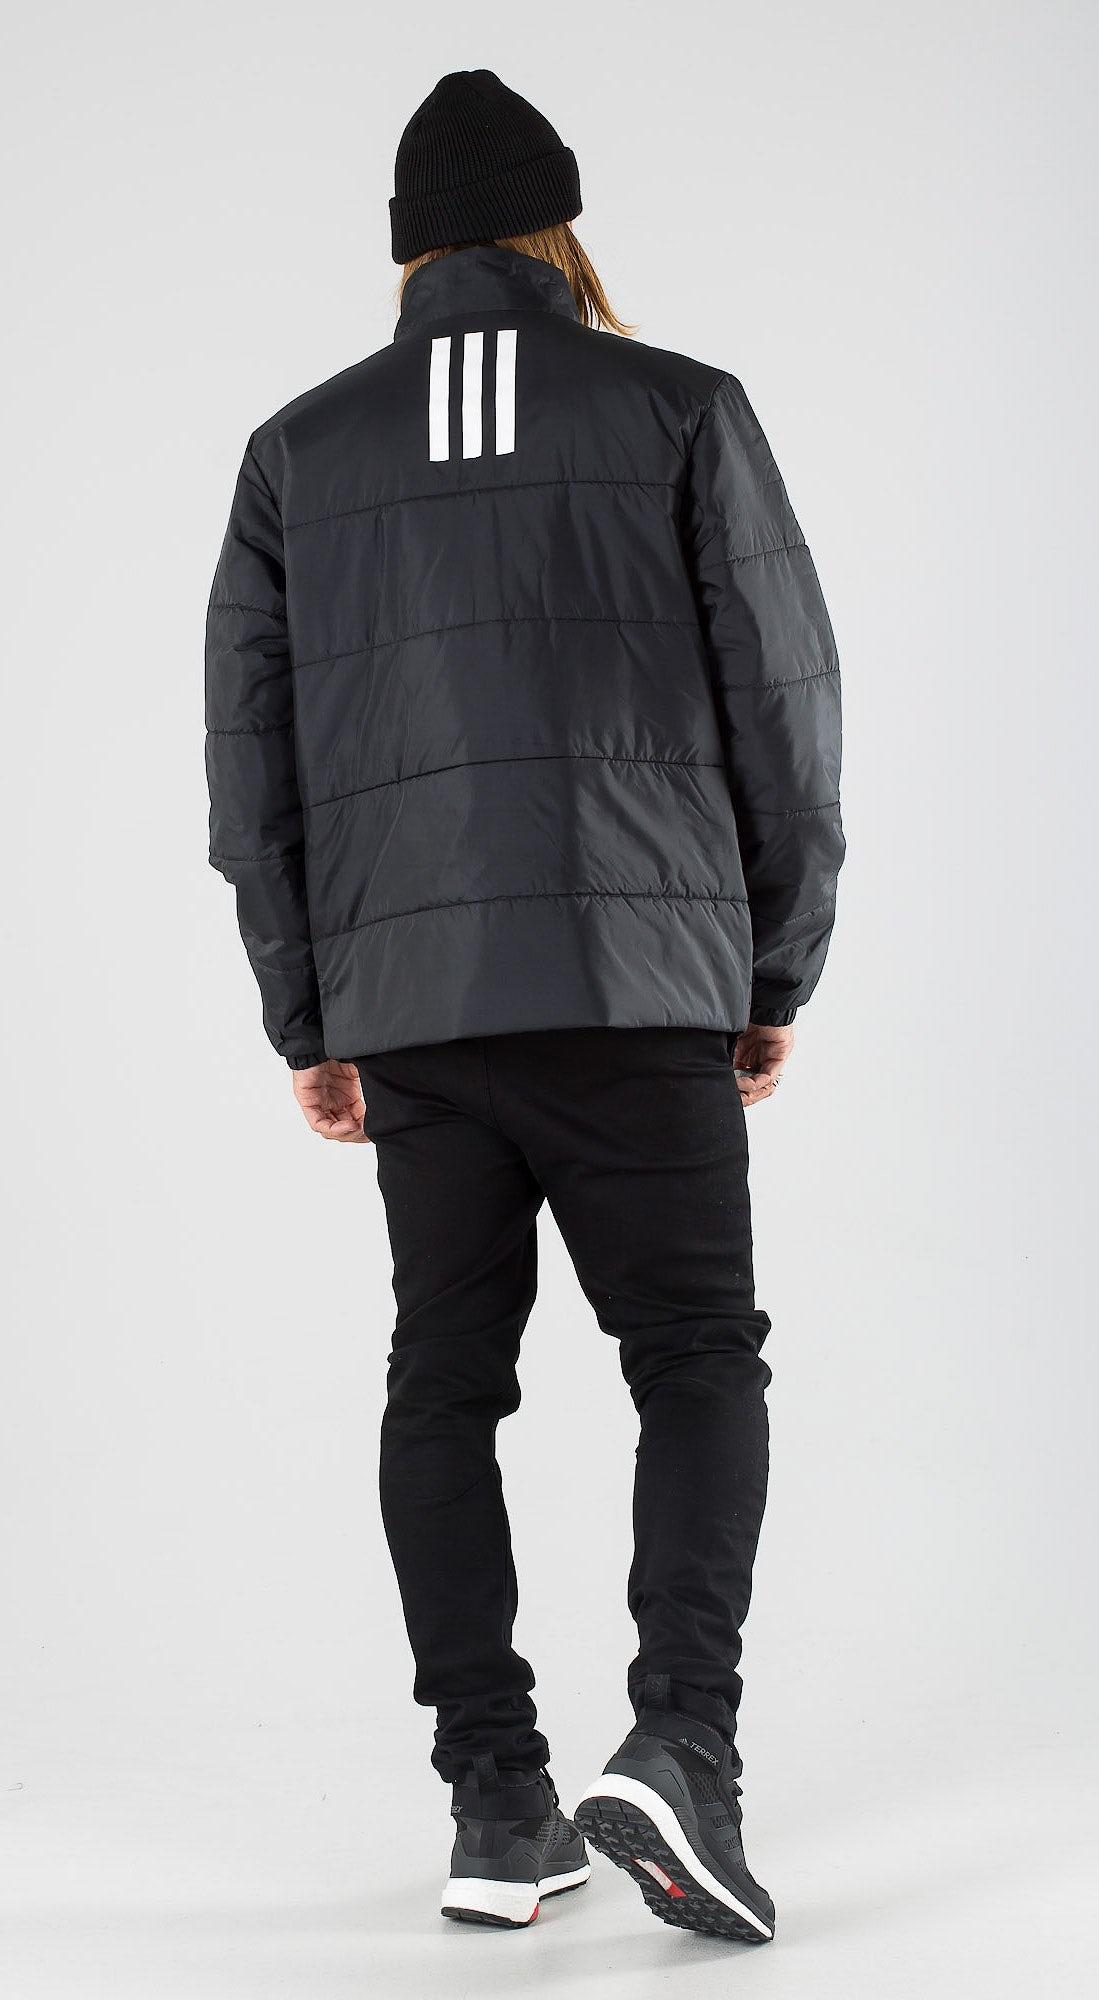 Adidas Terrex BSC 3S Insulated Black/Black